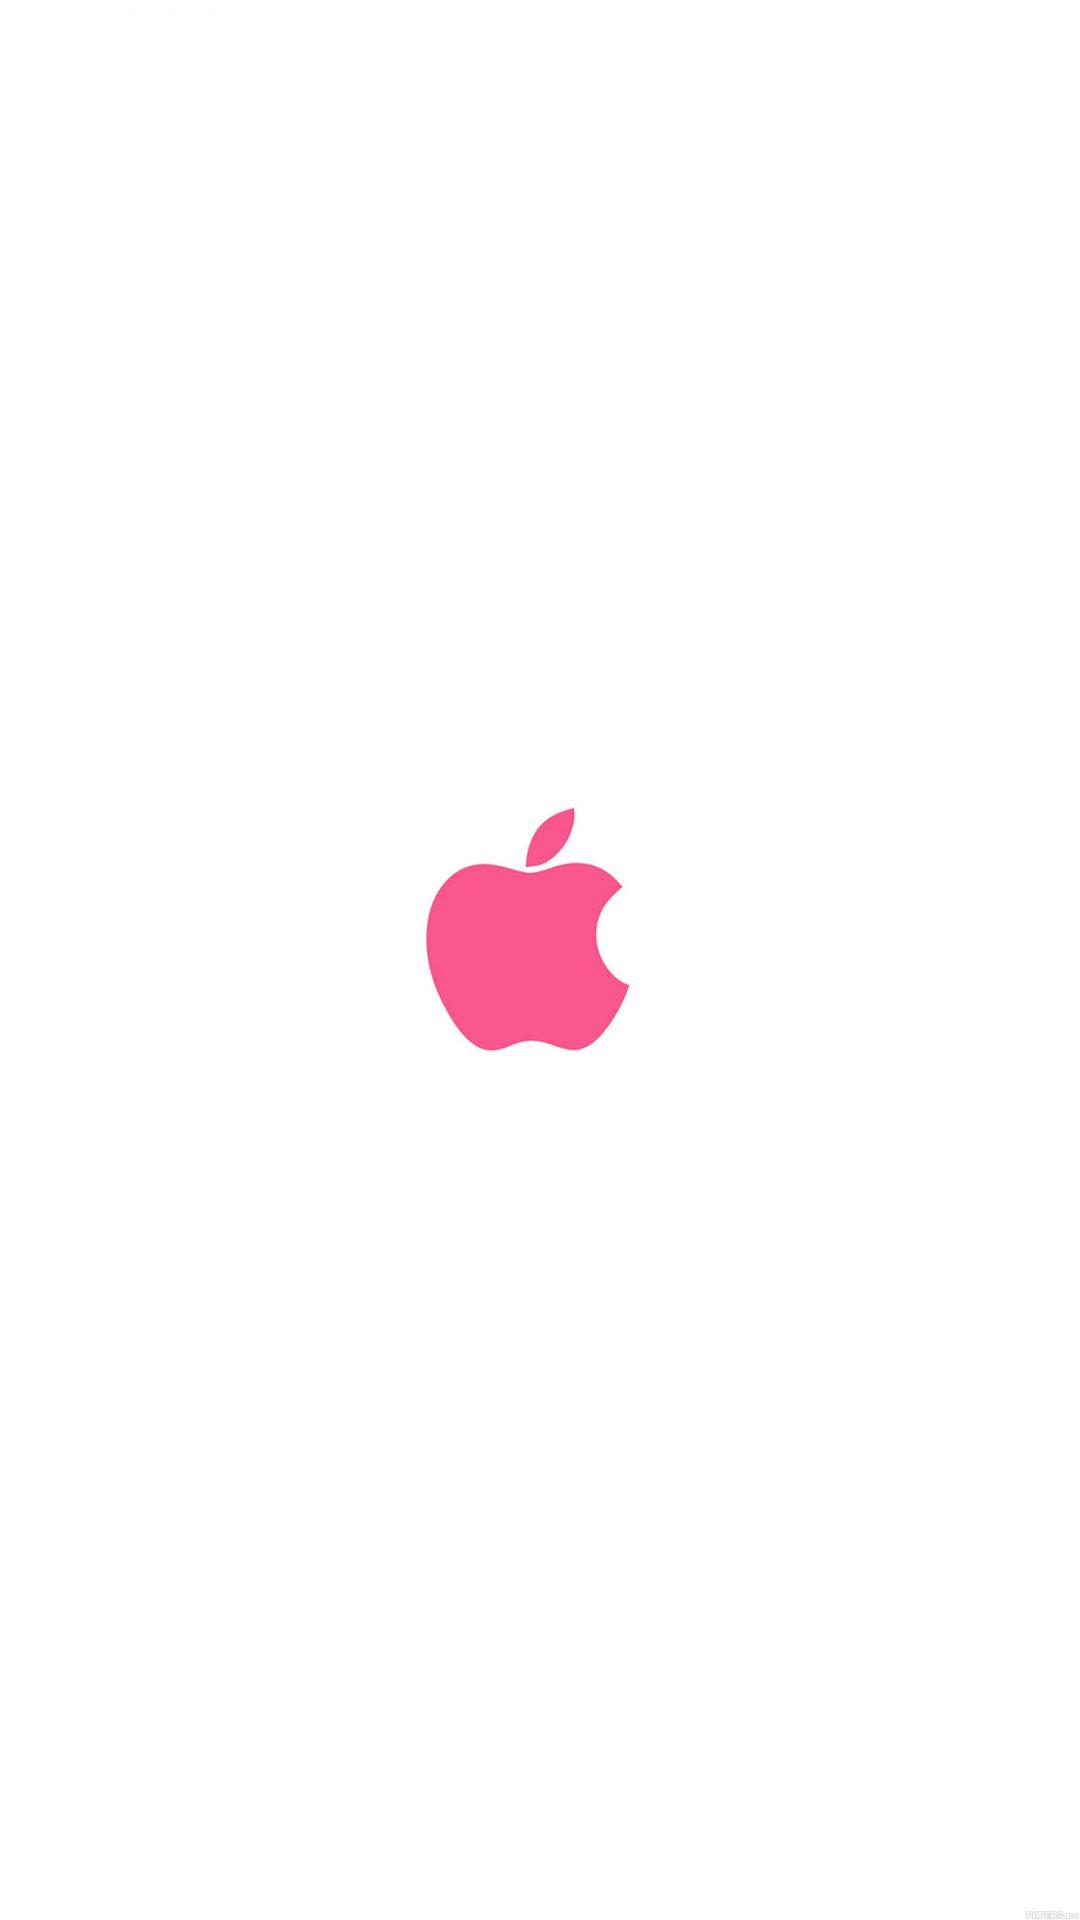 Apple Simple Logo Color Red Minimal